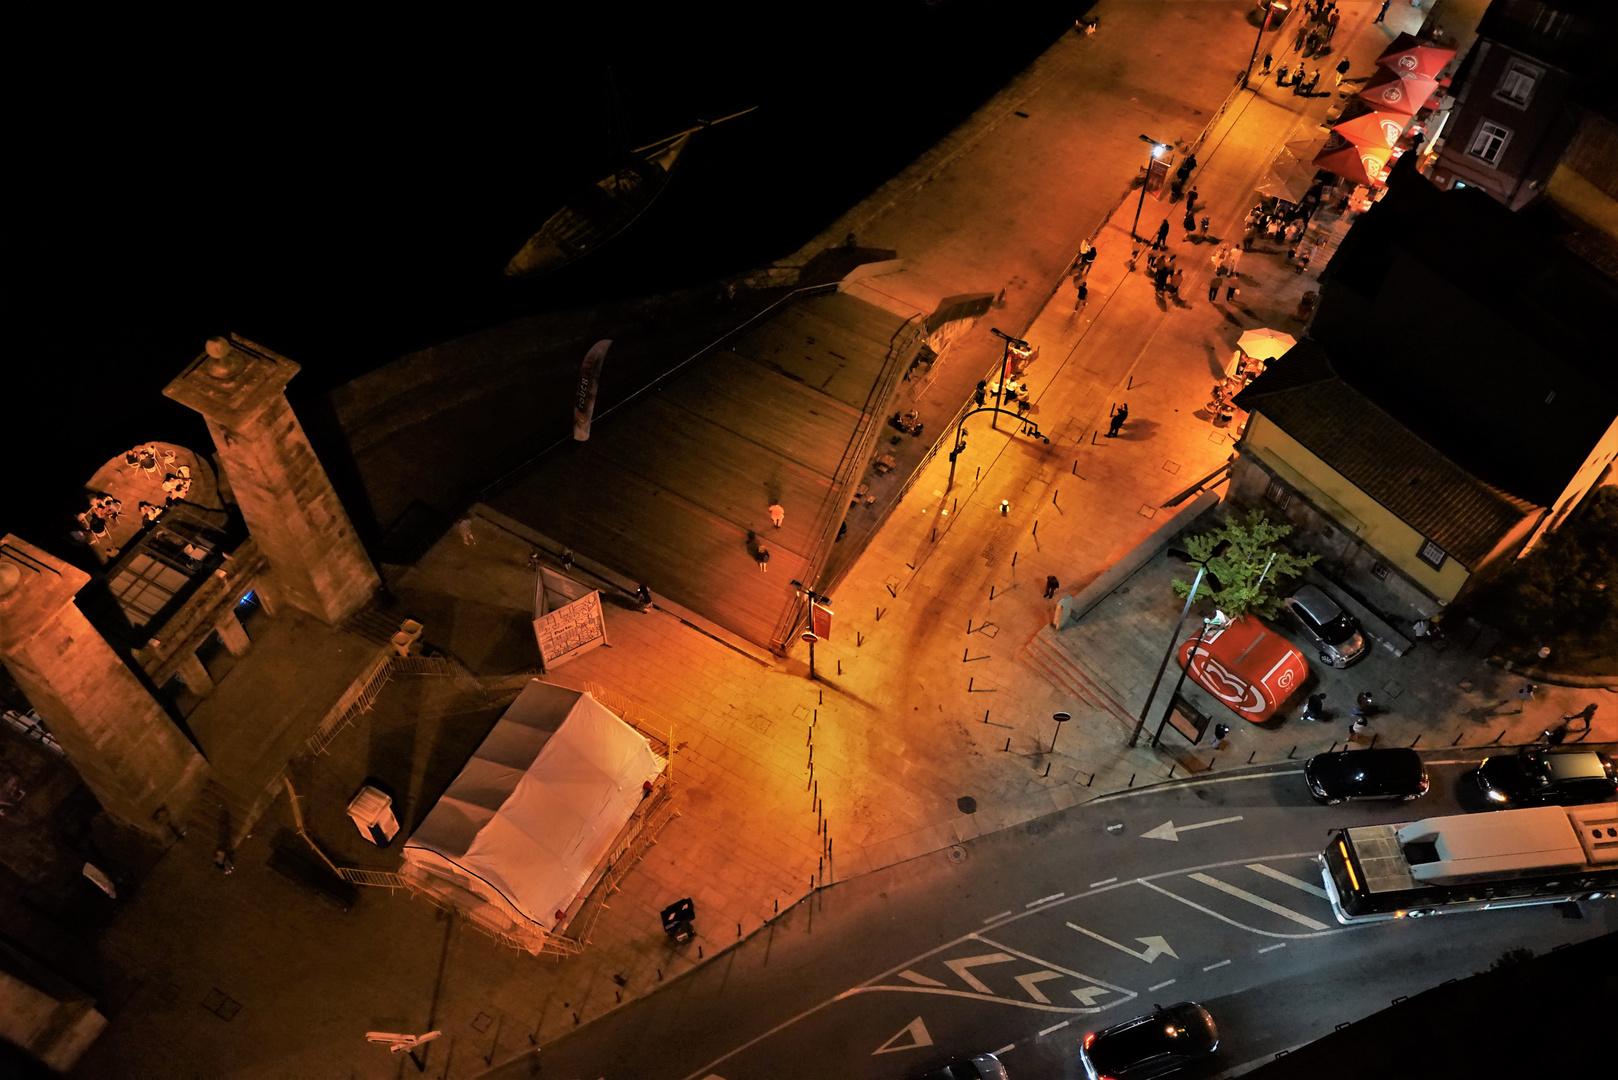 Porto night sights  2